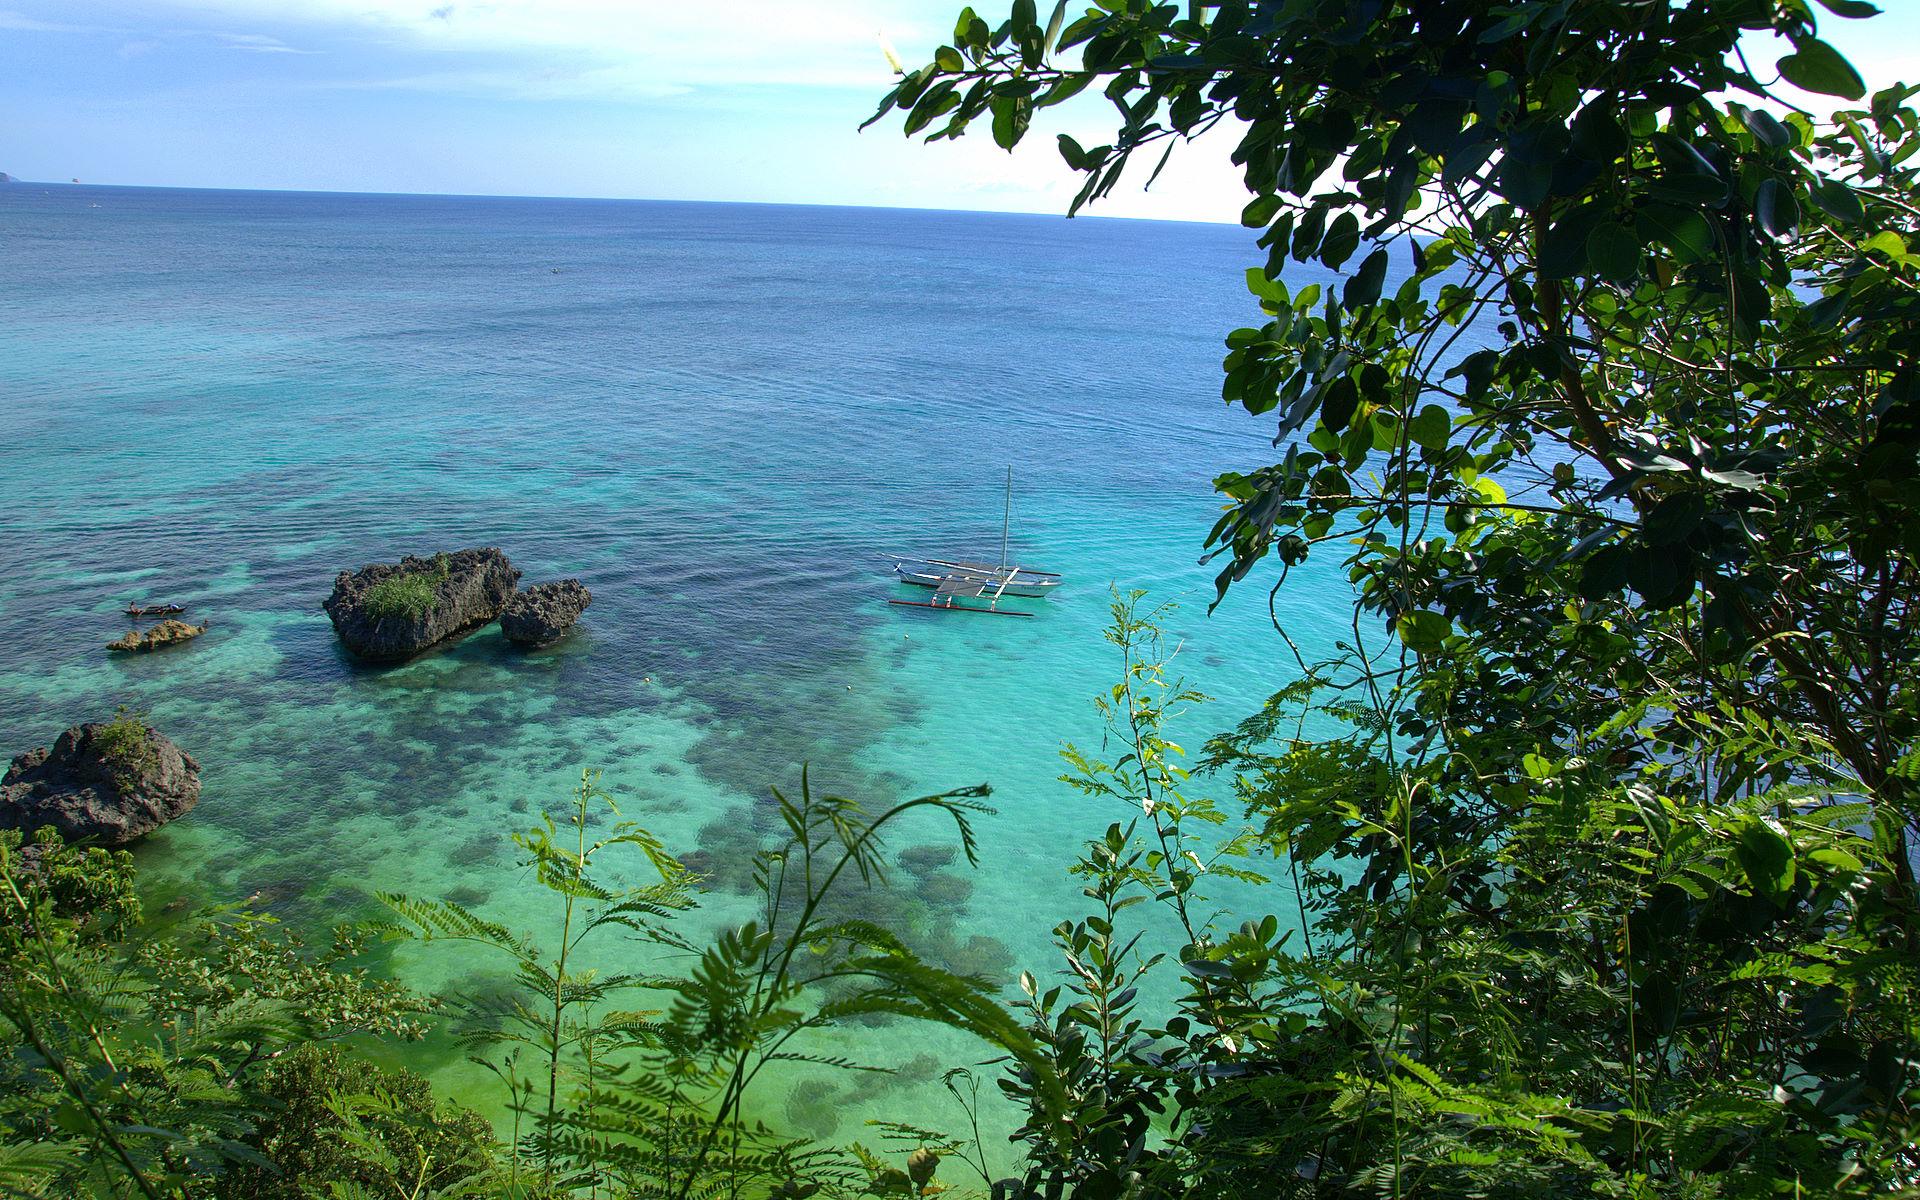 Tropical Island HD Wallpaper Download HD Wallpapers for Desktop 1920x1200